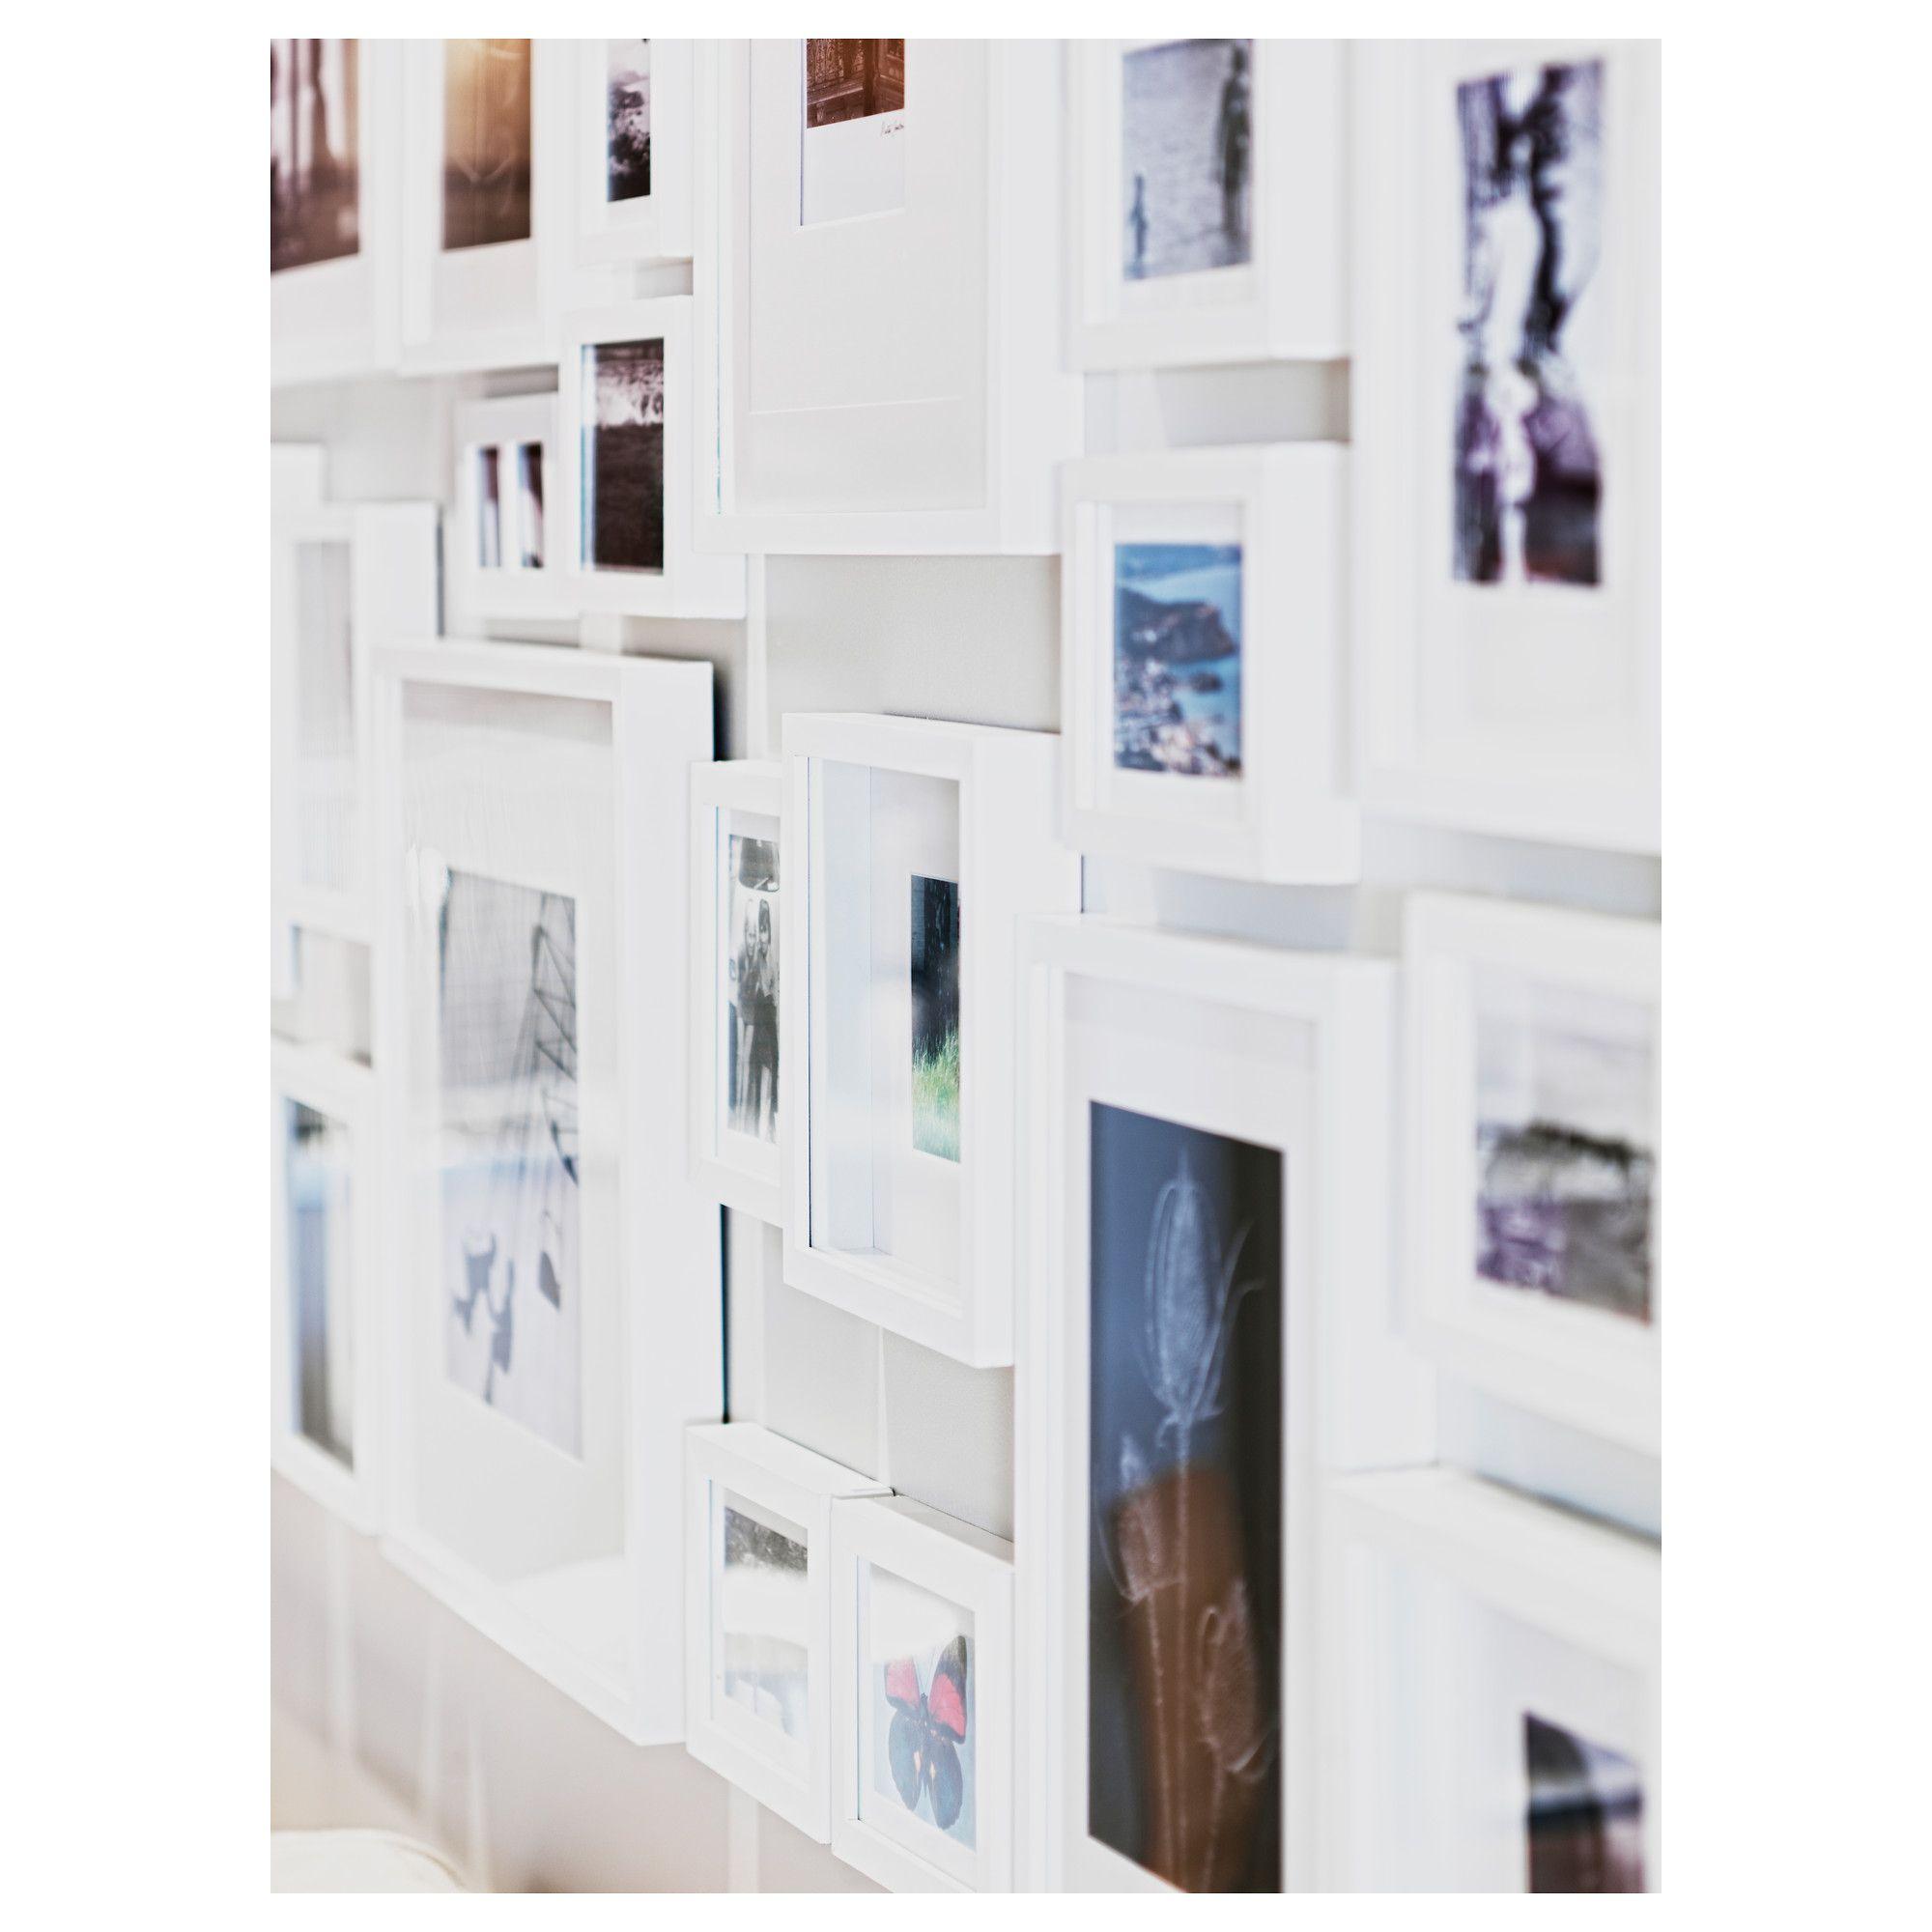 Cuadros Grandes De Ikea.Ikea Ribba Frame White Gallery Wall Ideas Ikea Hogar Tiendas